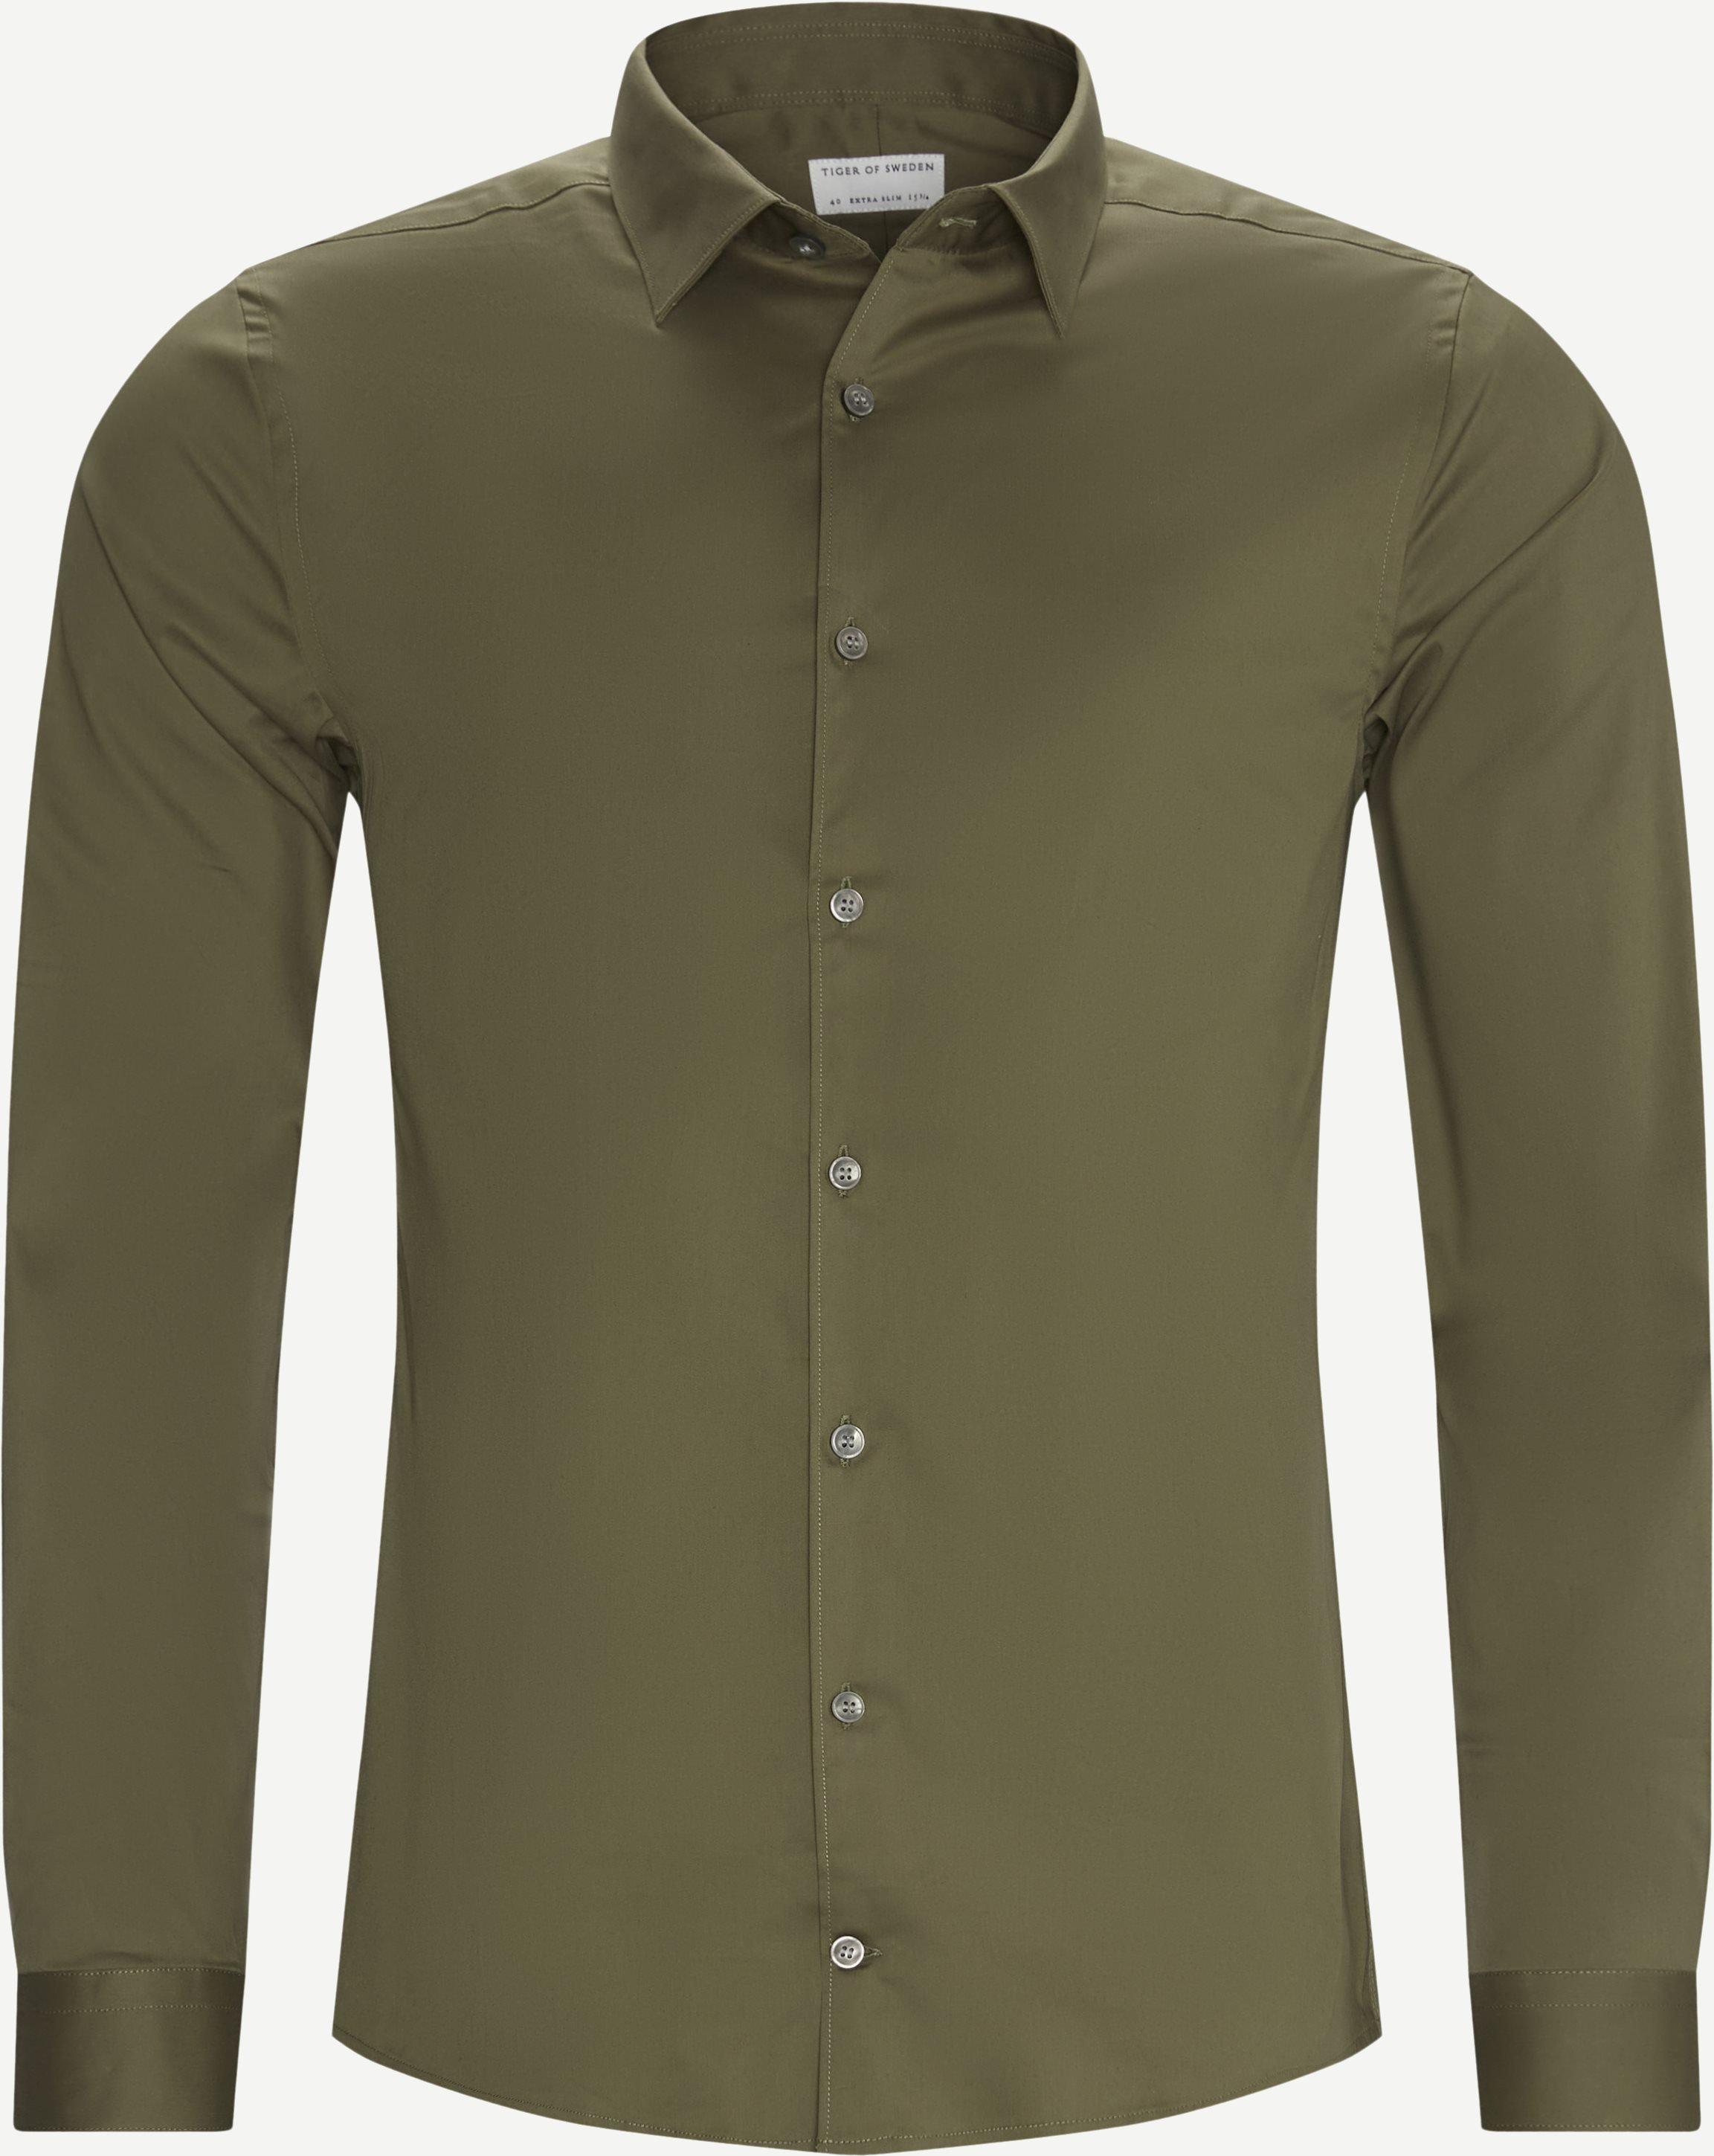 Hemden - Ekstra slim fit - Oliv